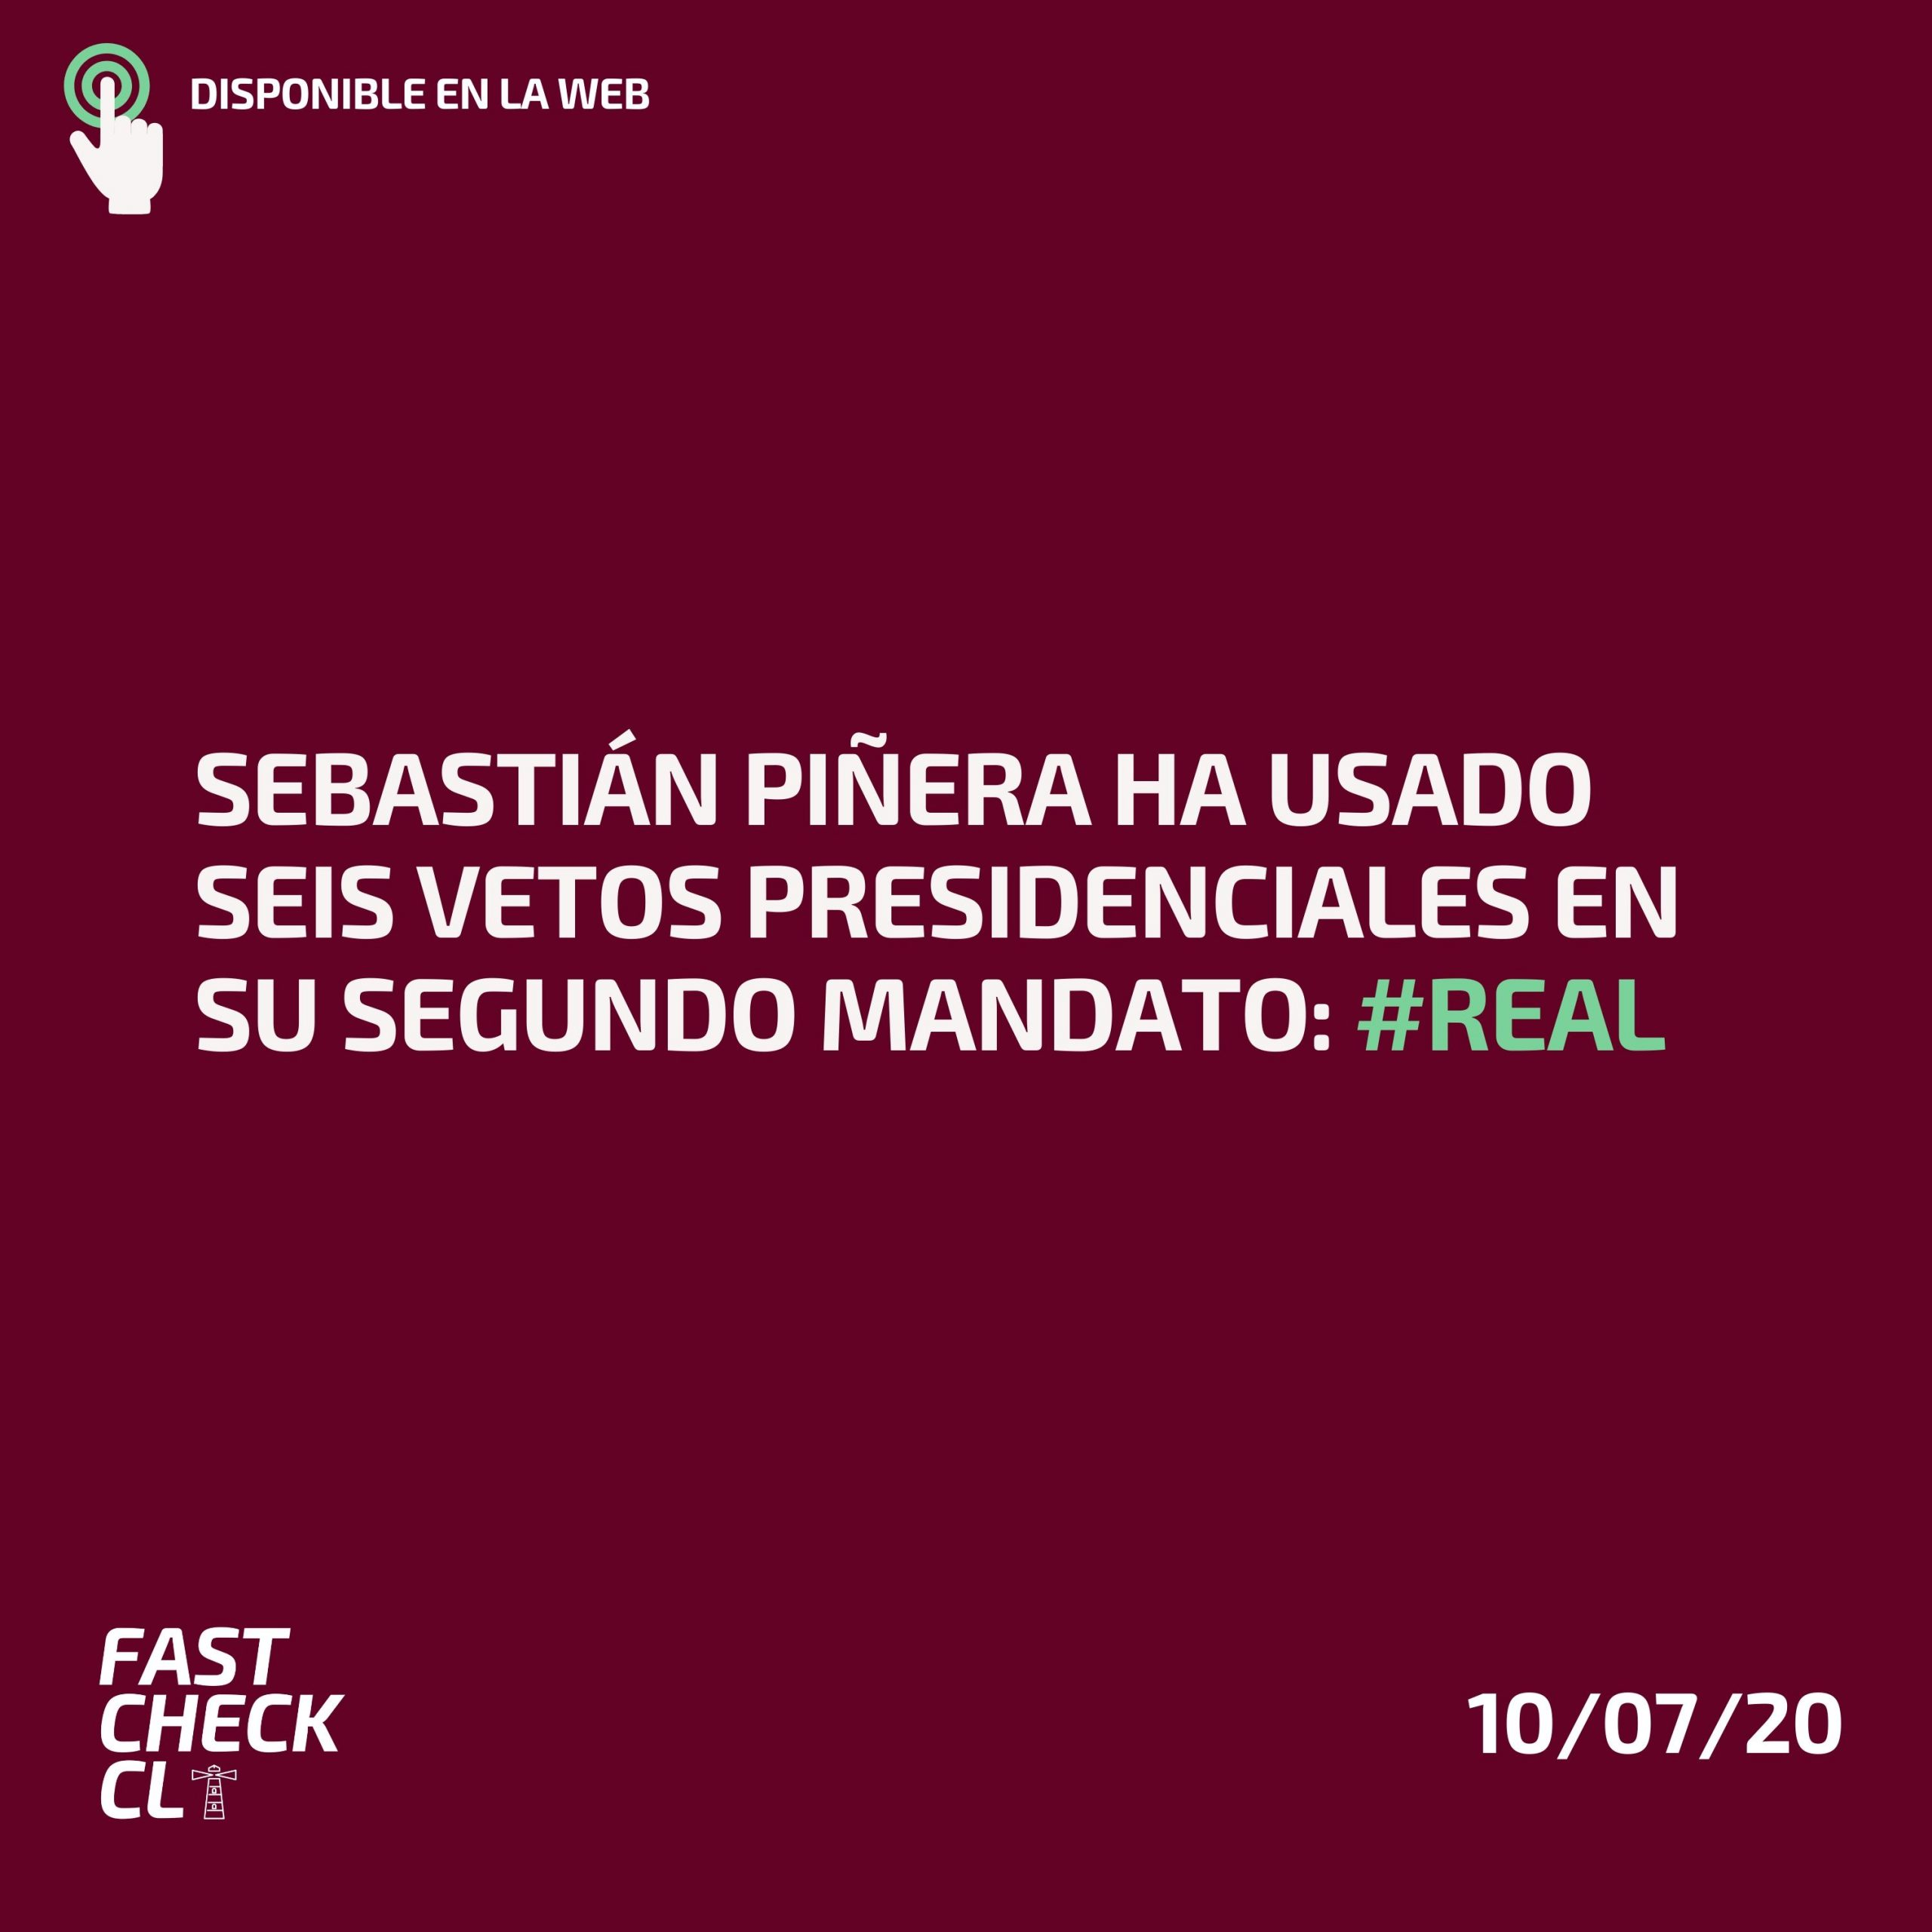 Sebastián Piñera ha usado seis vetos presidenciales en su segundo mandato #Real